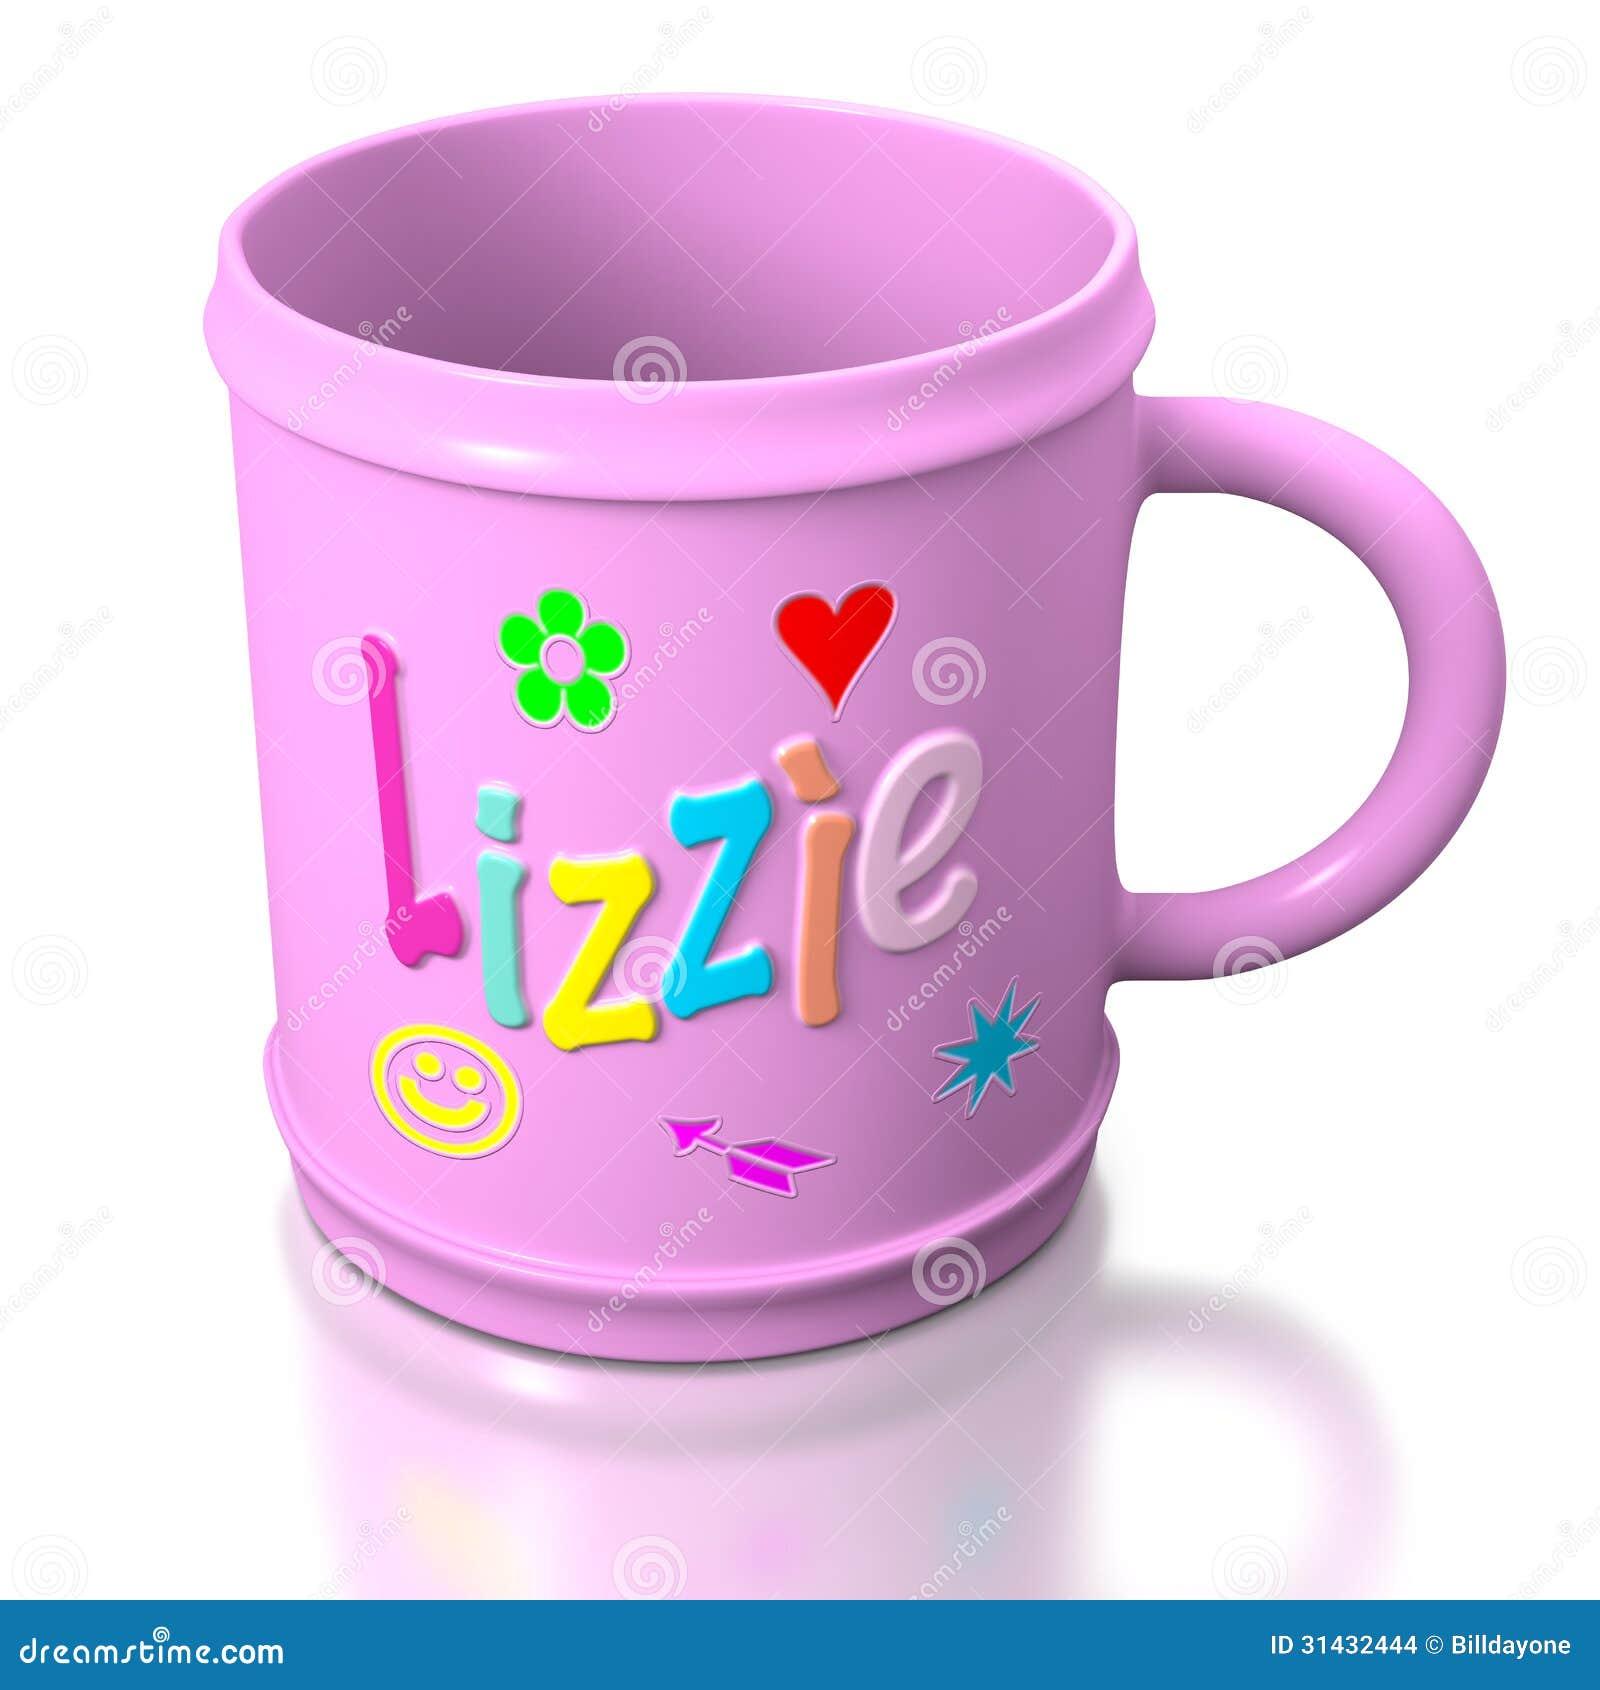 Lizzie Personalized Plastic Mug Stock Images Image 31432444